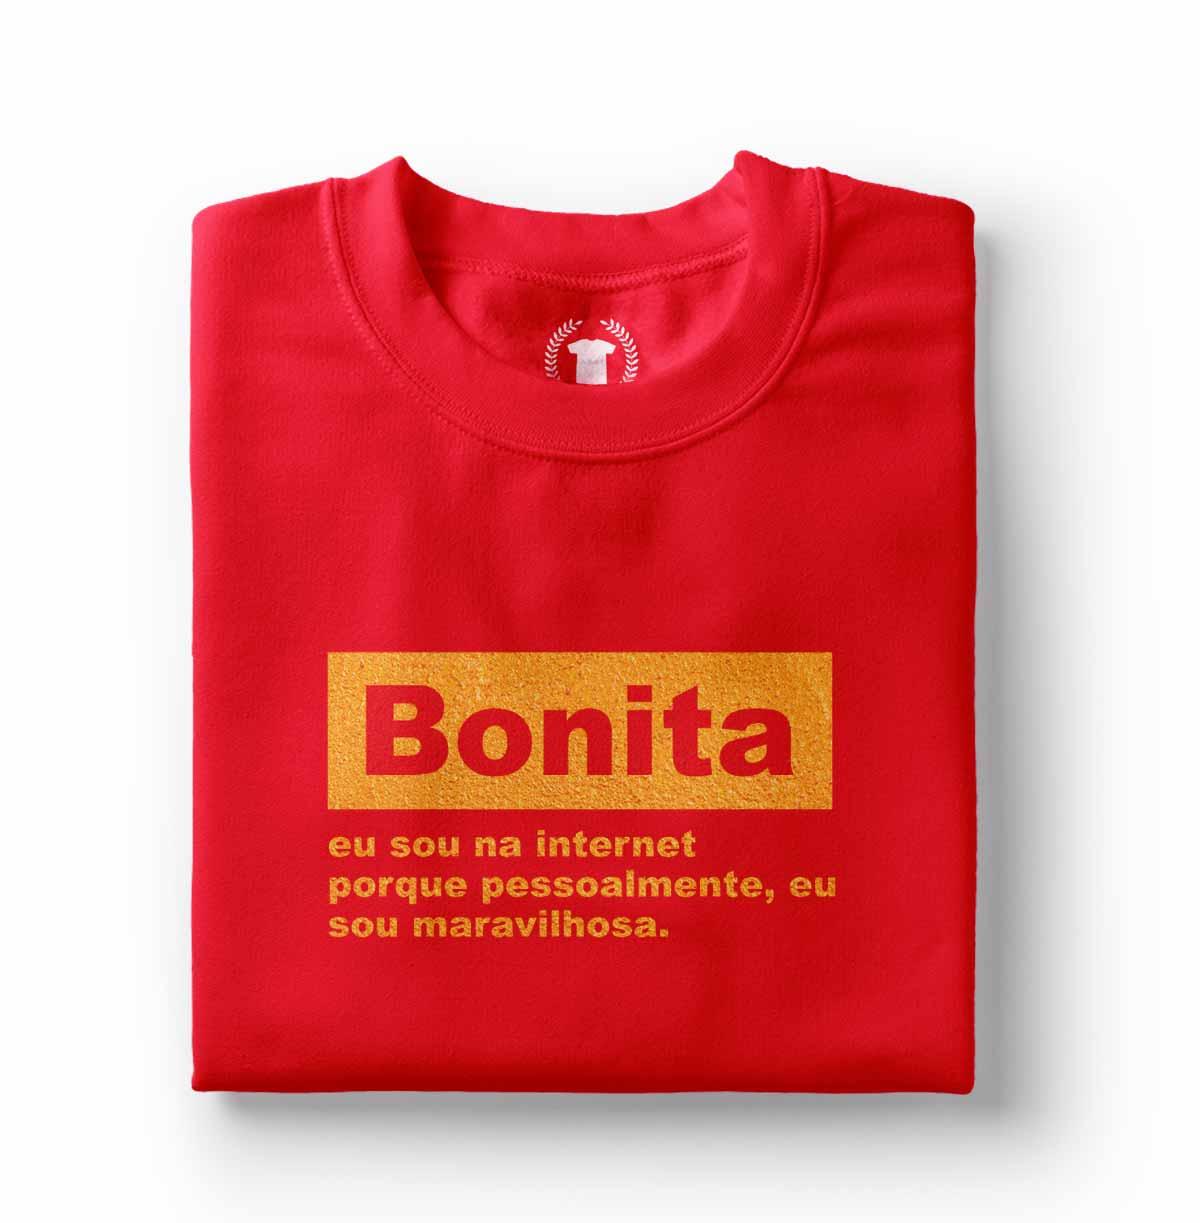 camisa camiseta feminina divertida bonita maravilhosa